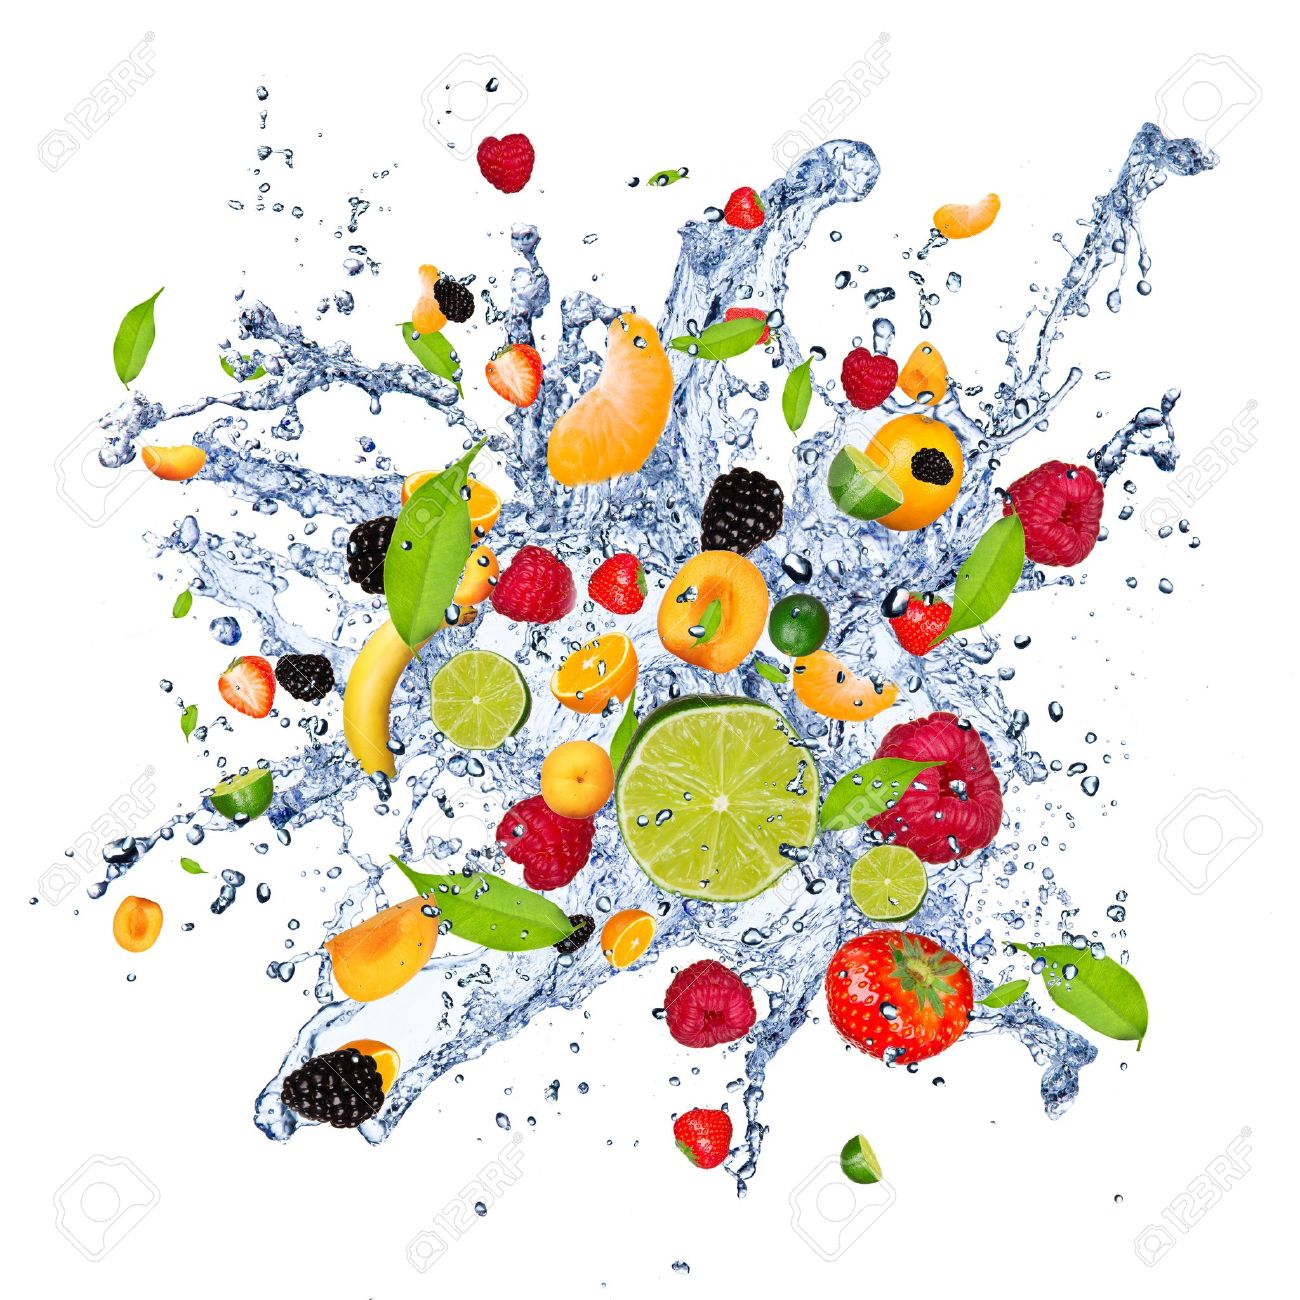 Fruit mix in water splash, isolated on white background Stock Photo -  13551982